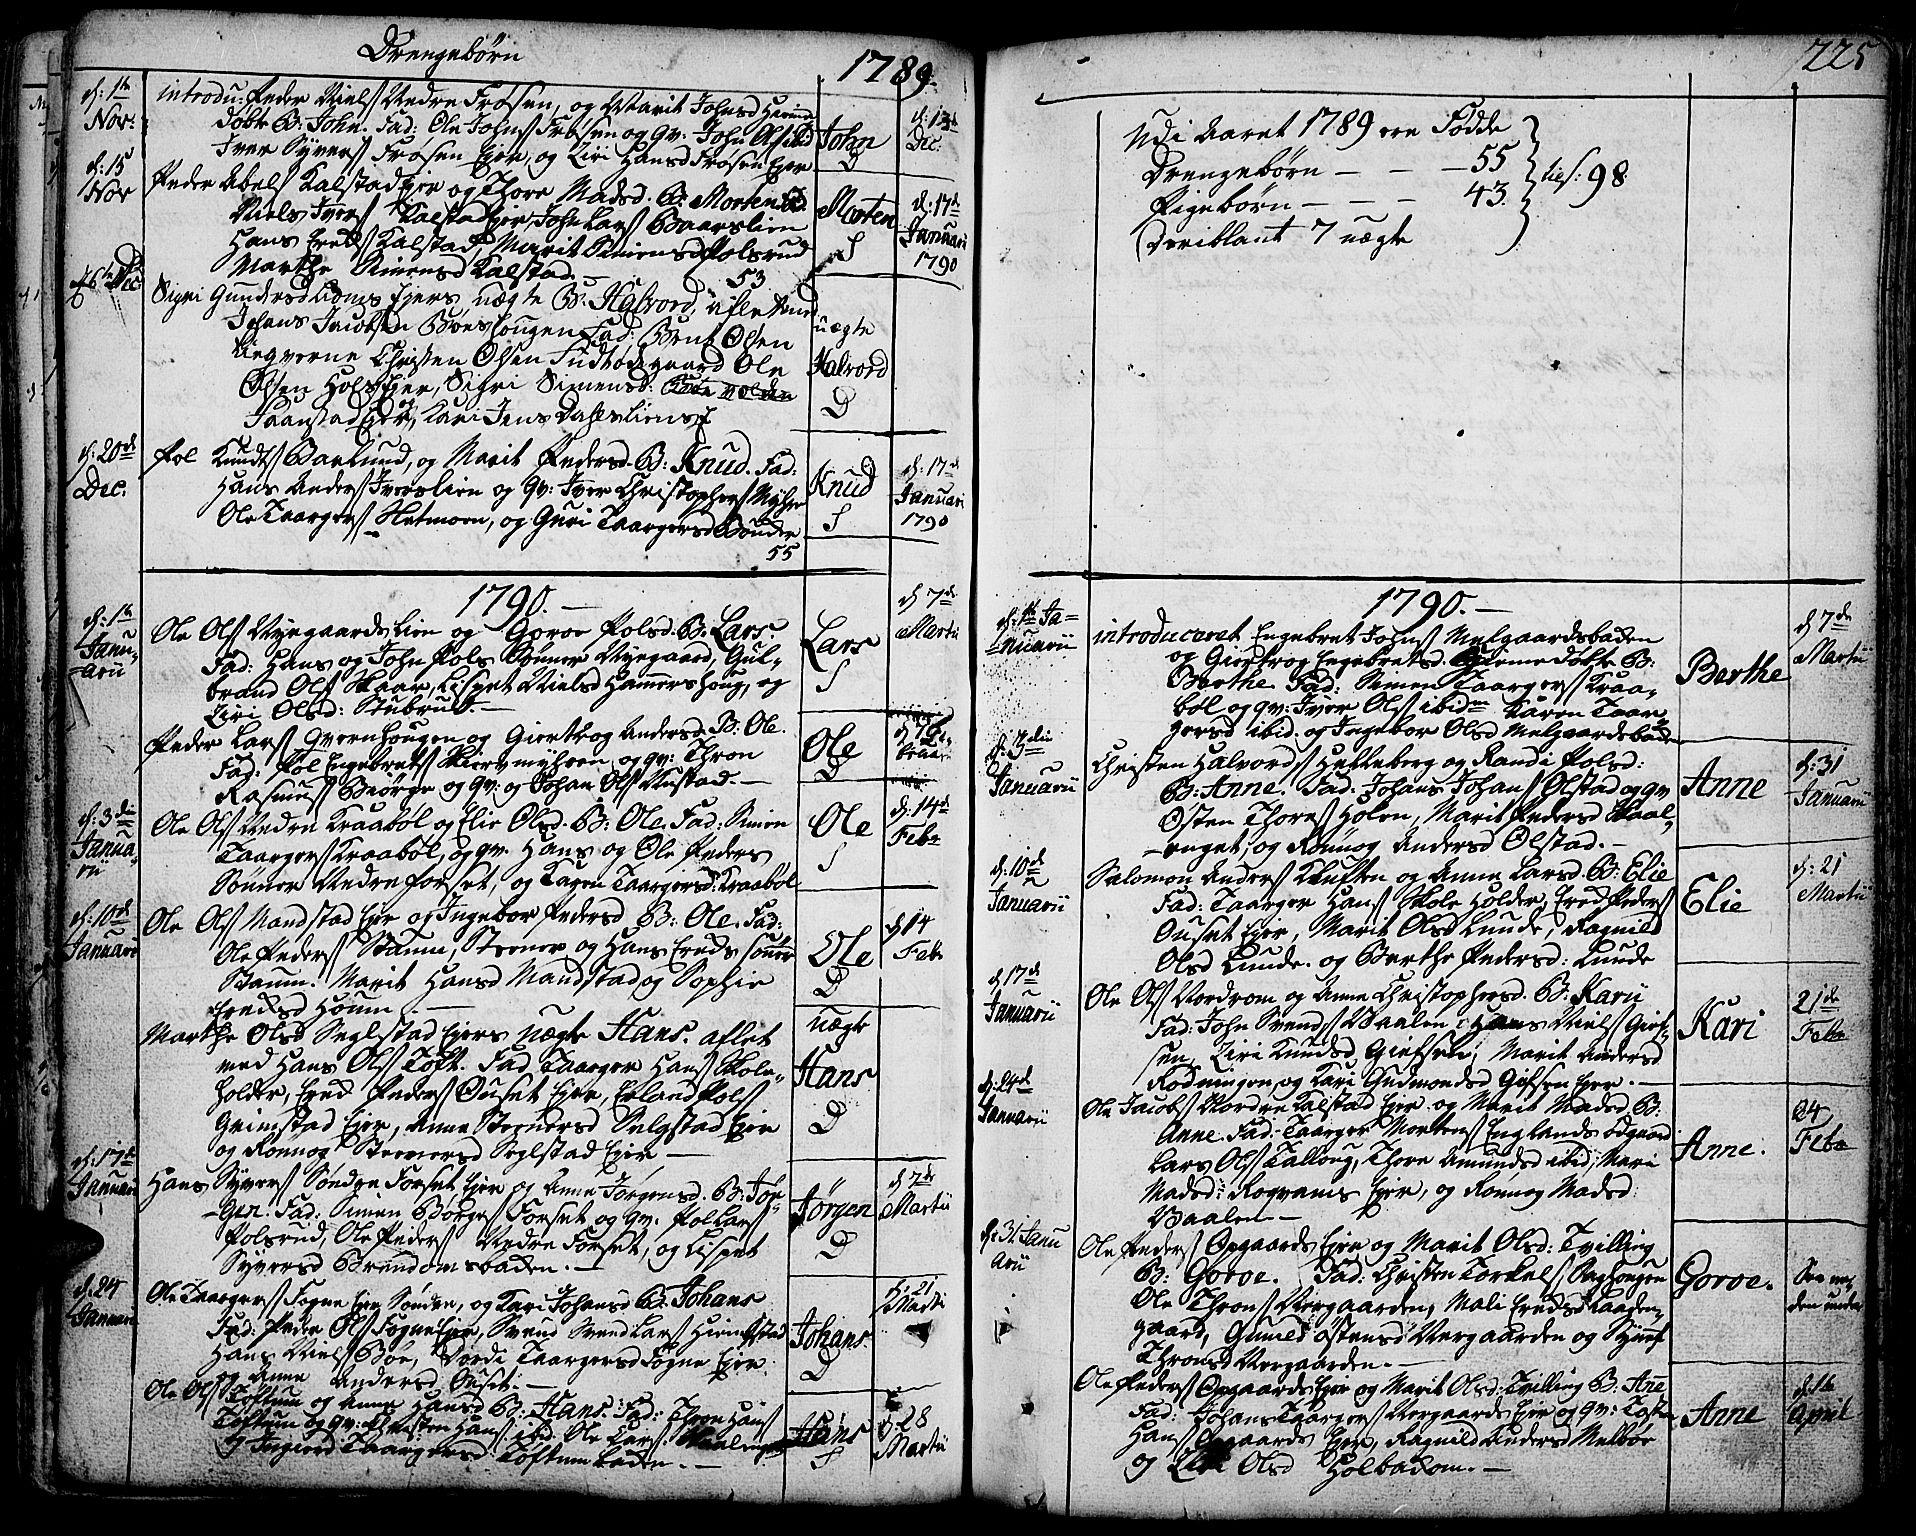 SAH, Gausdal prestekontor, Ministerialbok nr. 3, 1758-1809, s. 225